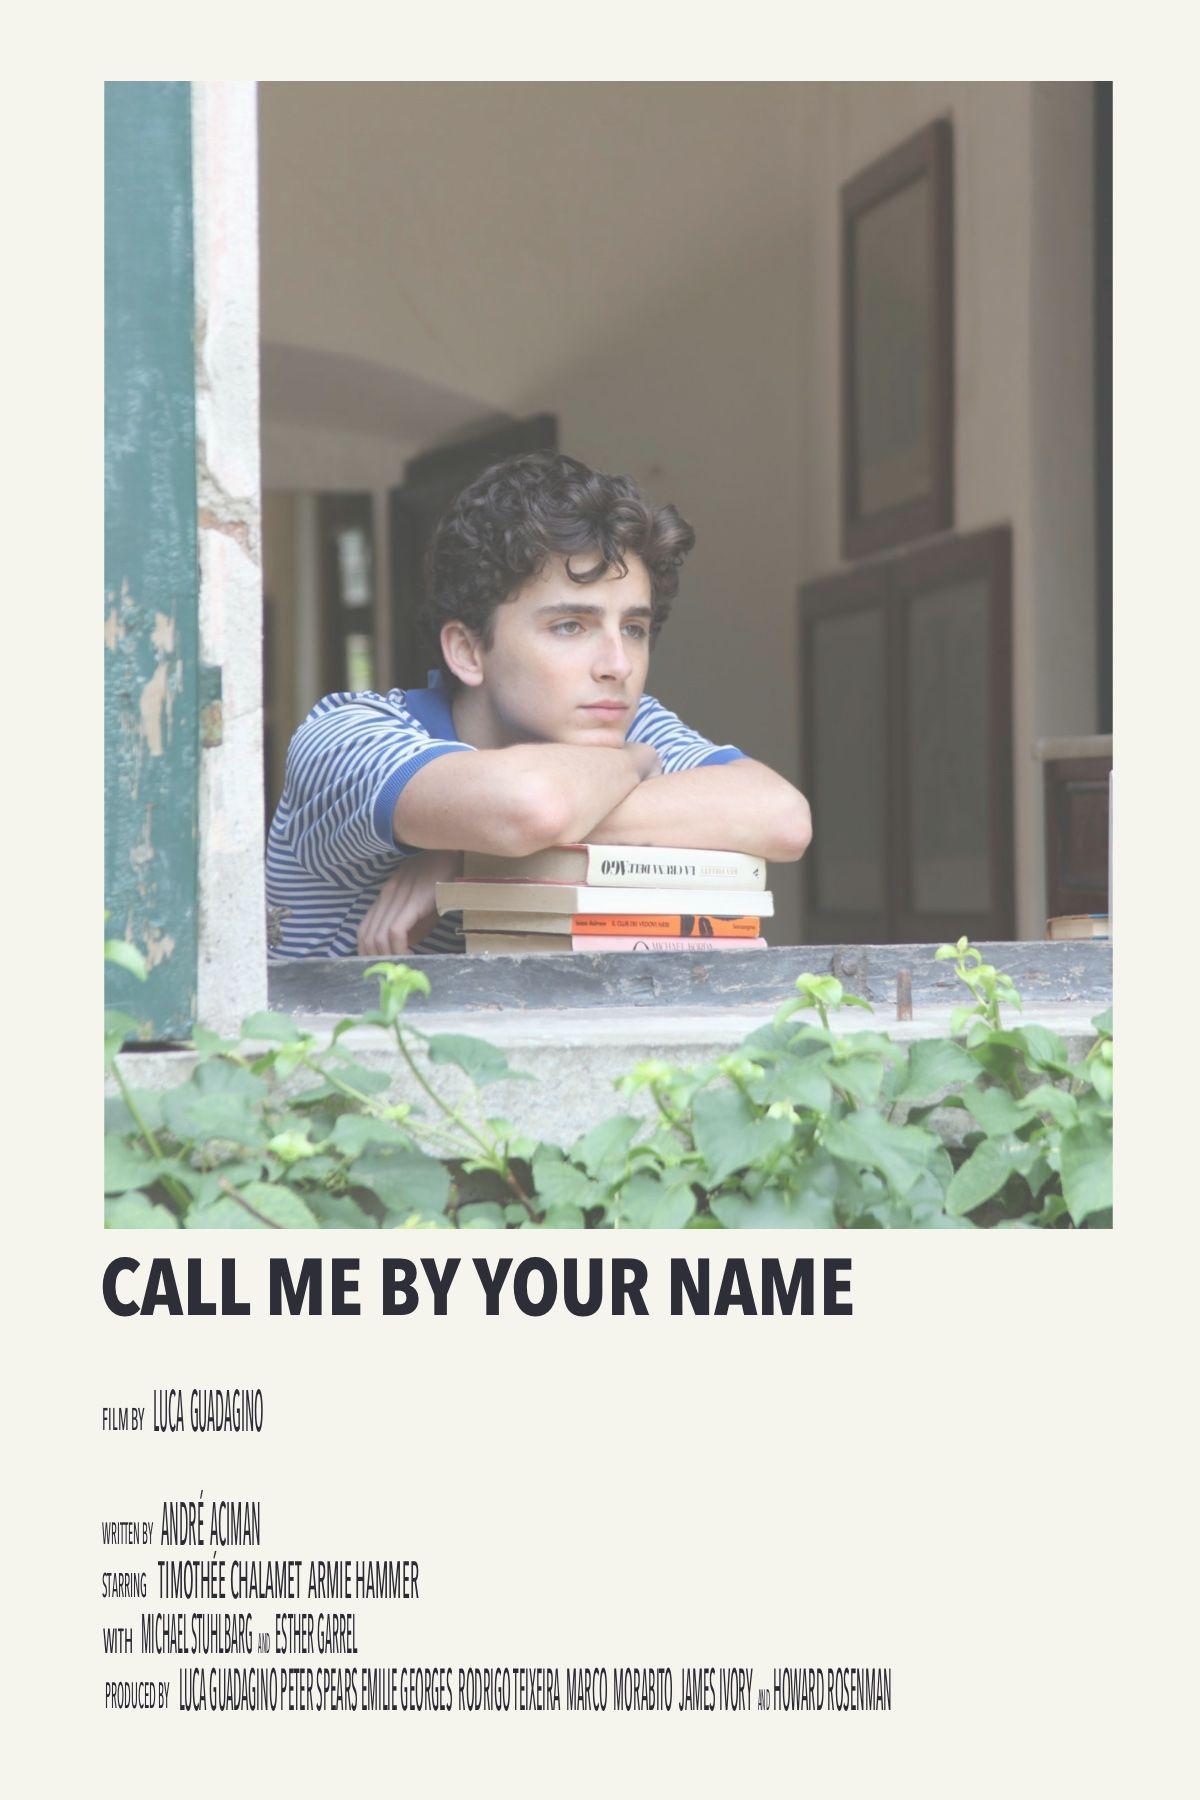 call me by your name by priya